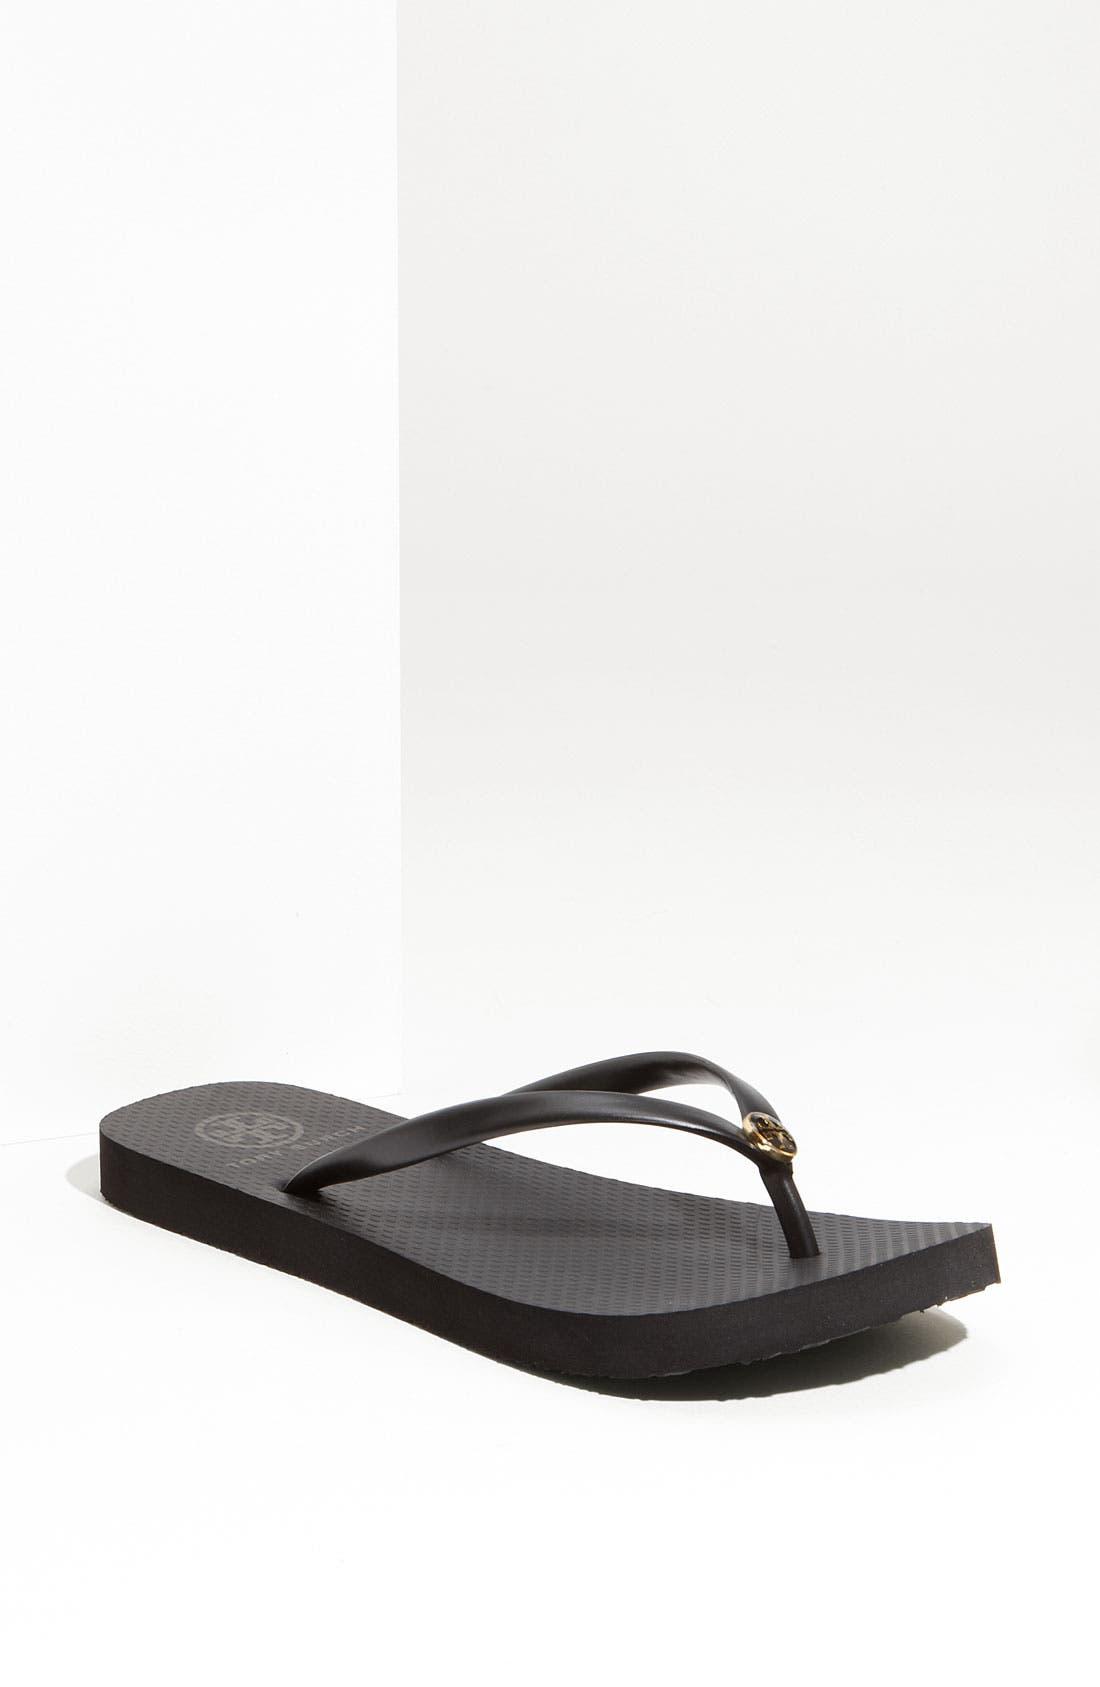 TORY BURCH 'Thin' Flip Flop, Main, color, BLACK BLACK